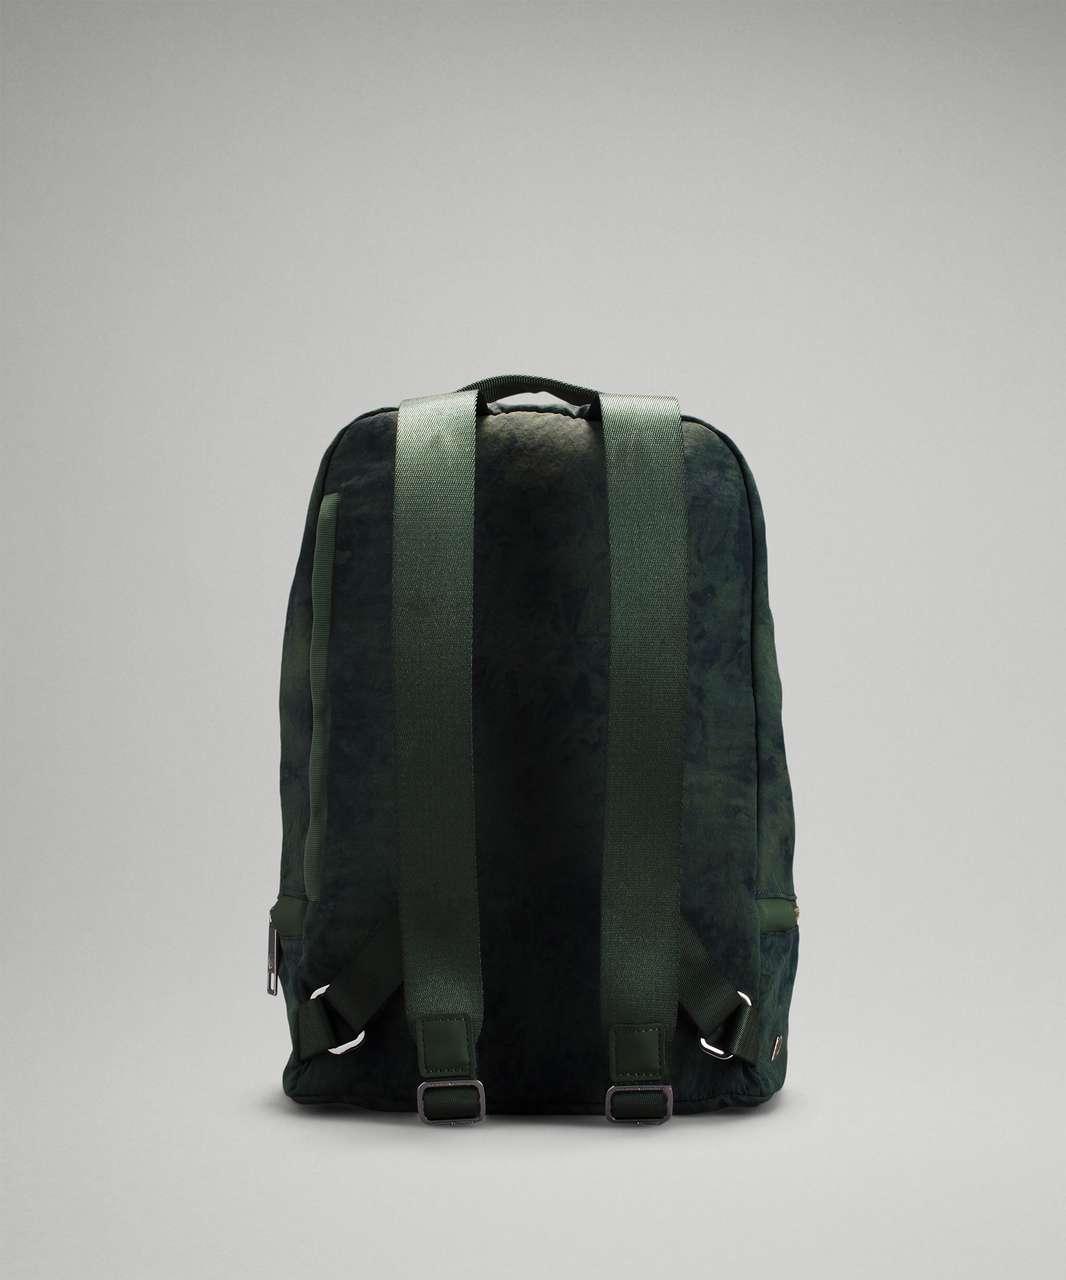 Lululemon City Adventurer Backpack 10L - Aquila Green Twill Multi